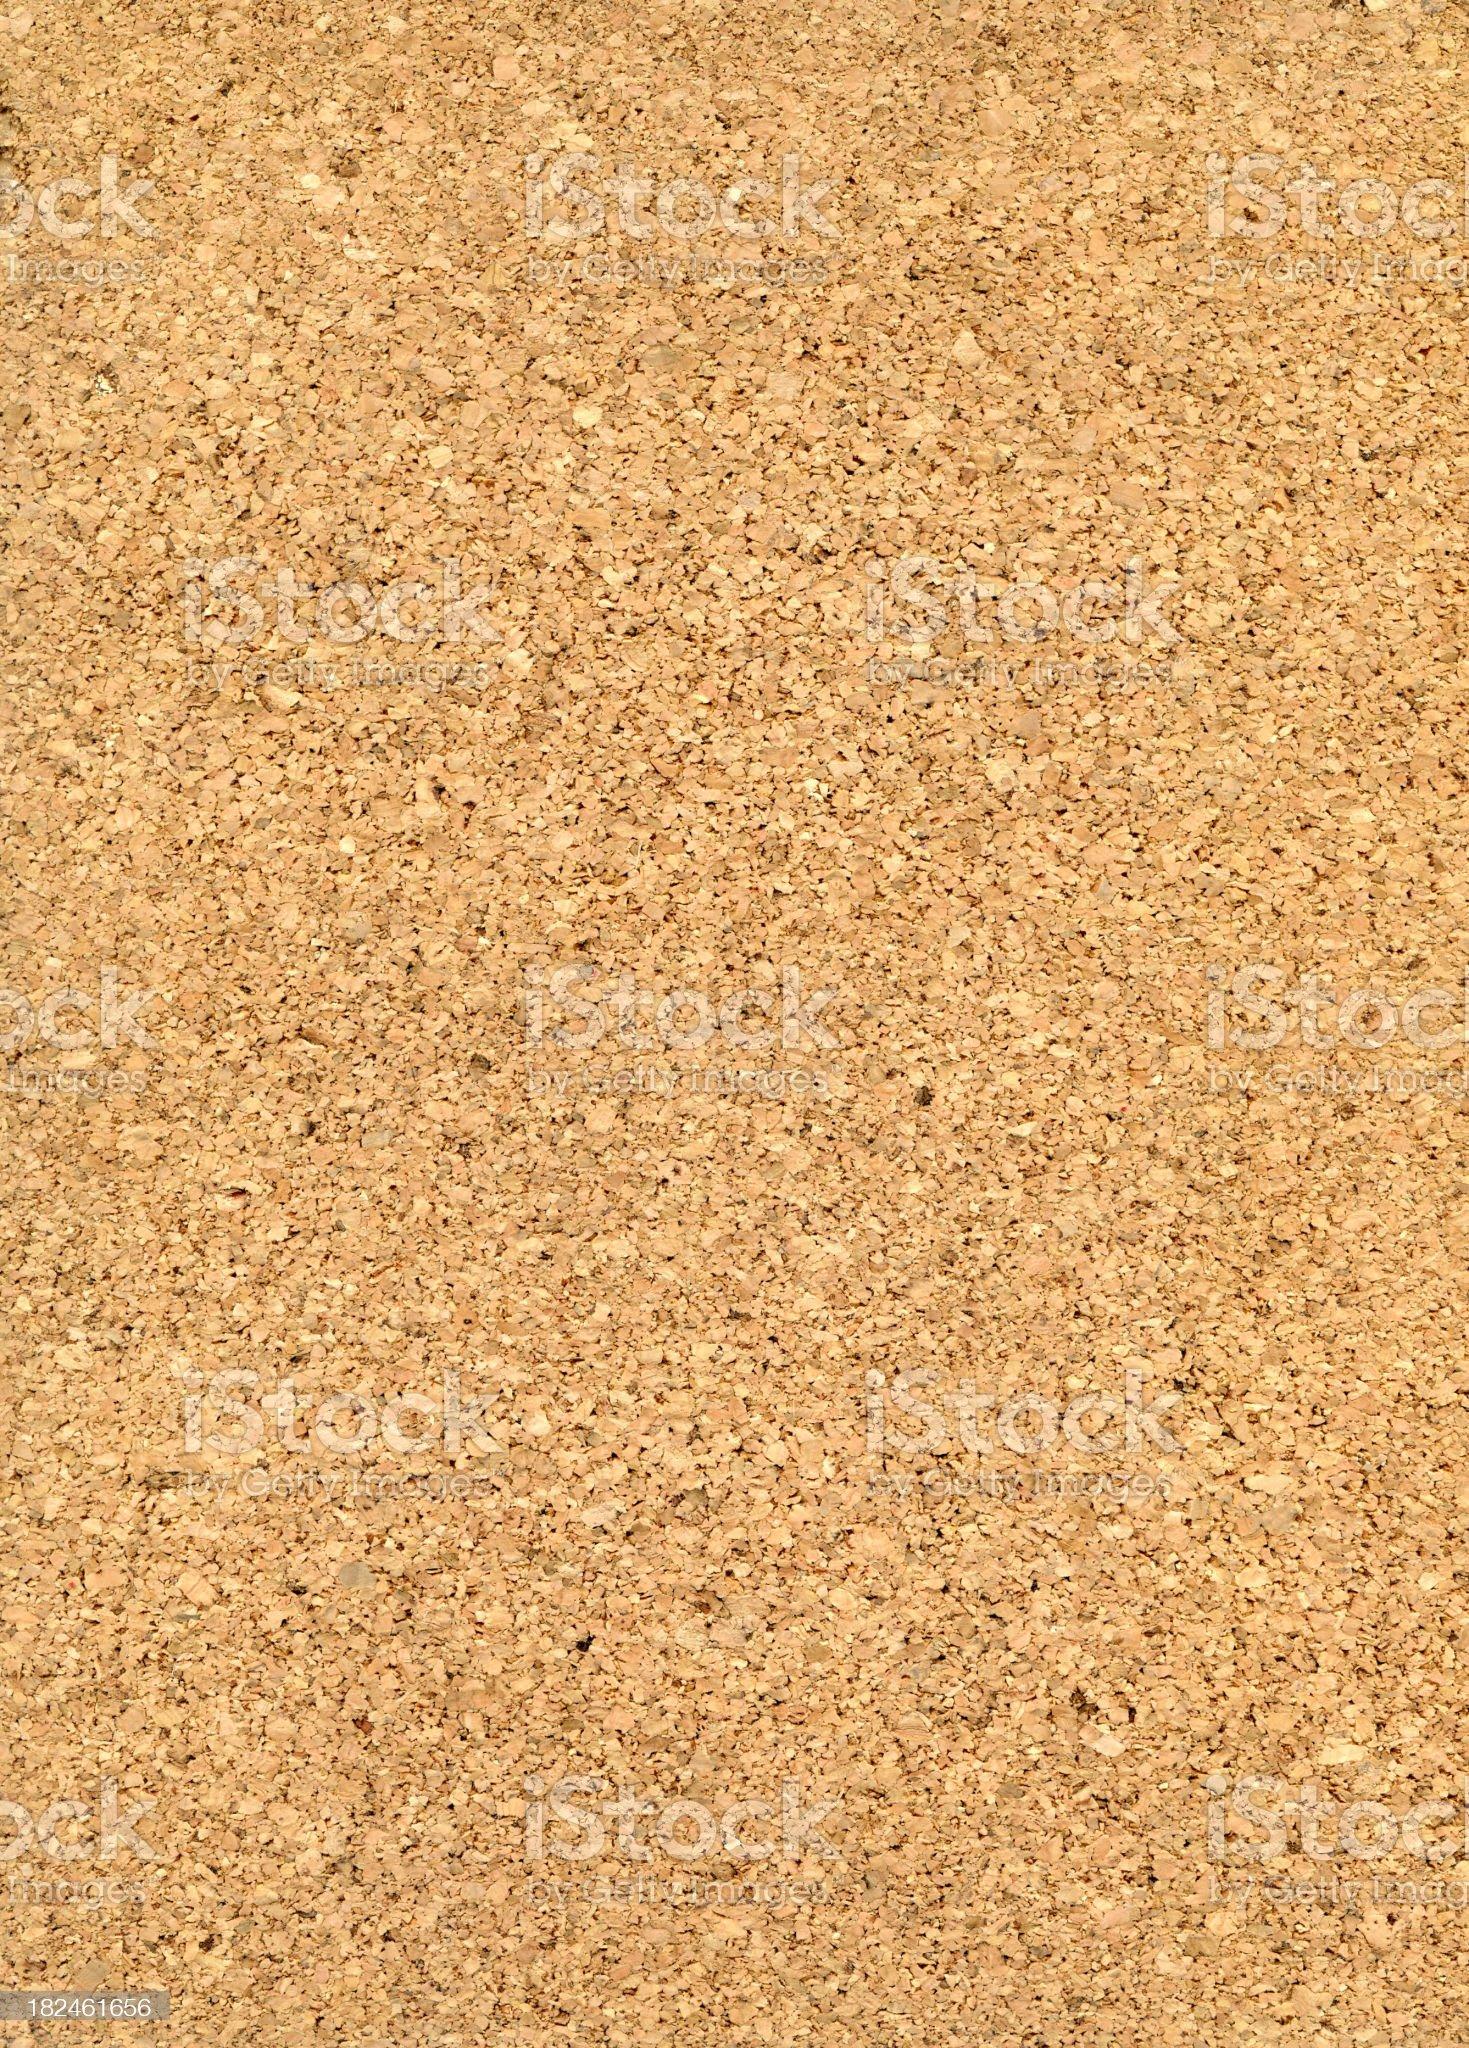 cork background royalty-free stock photo